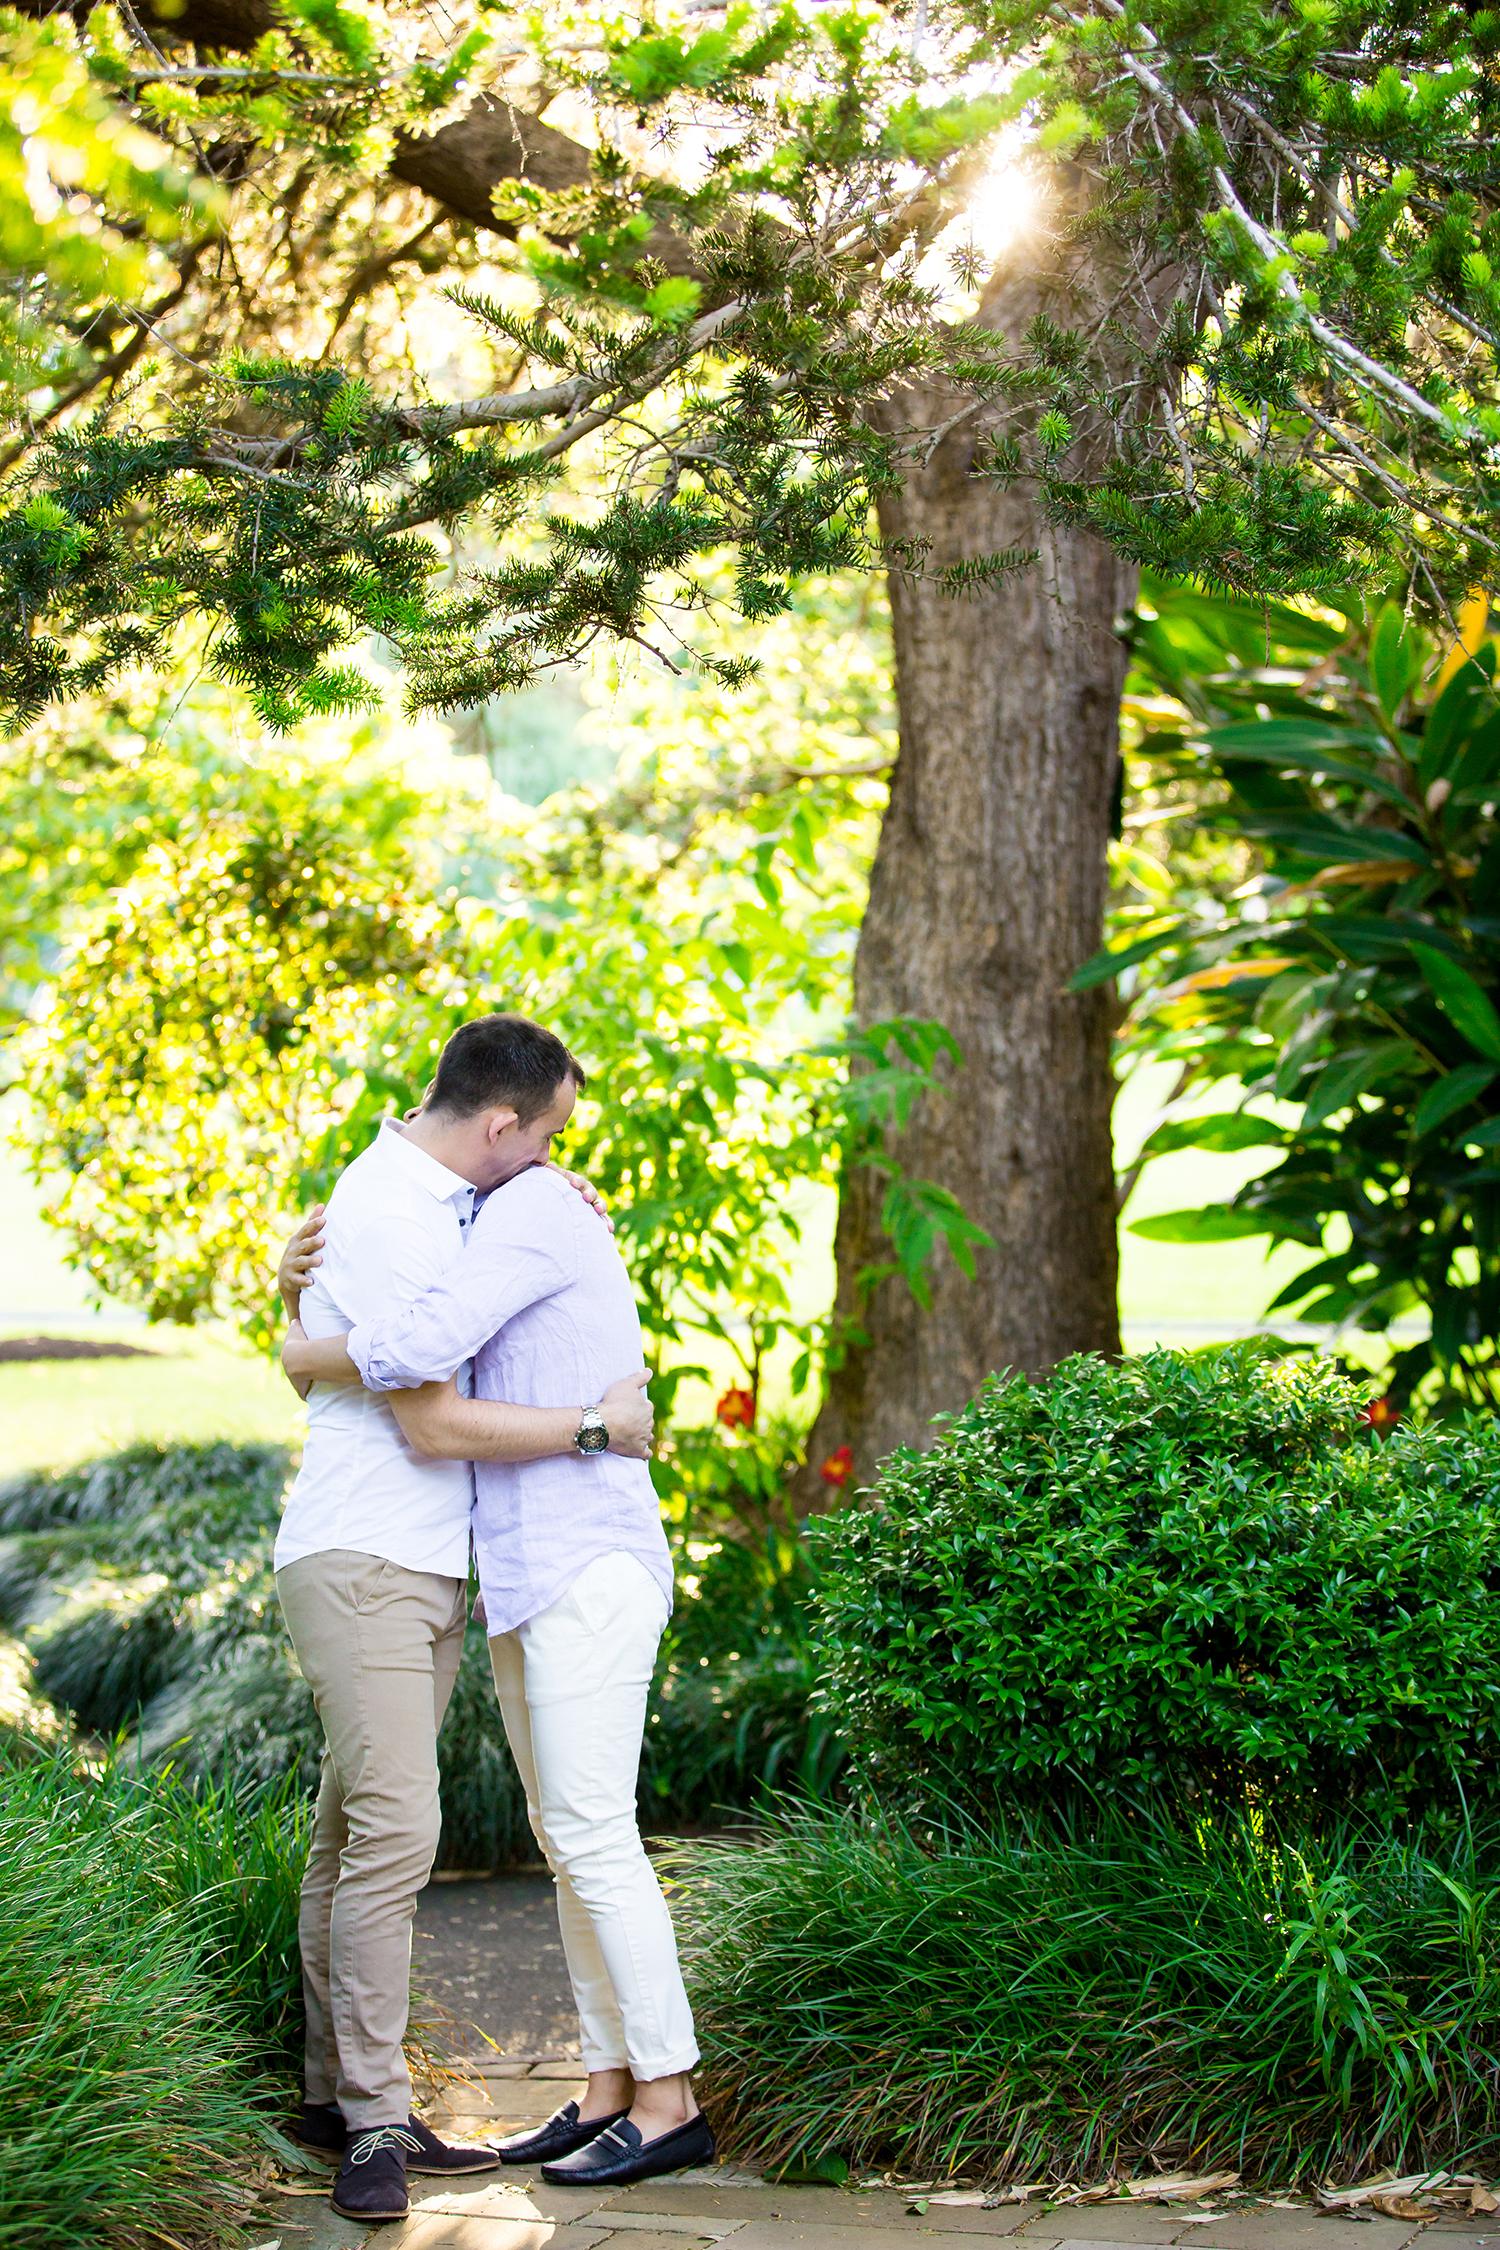 Sydney Gay Wedding Photographer - Jennifer Lam Photography (11).jpg